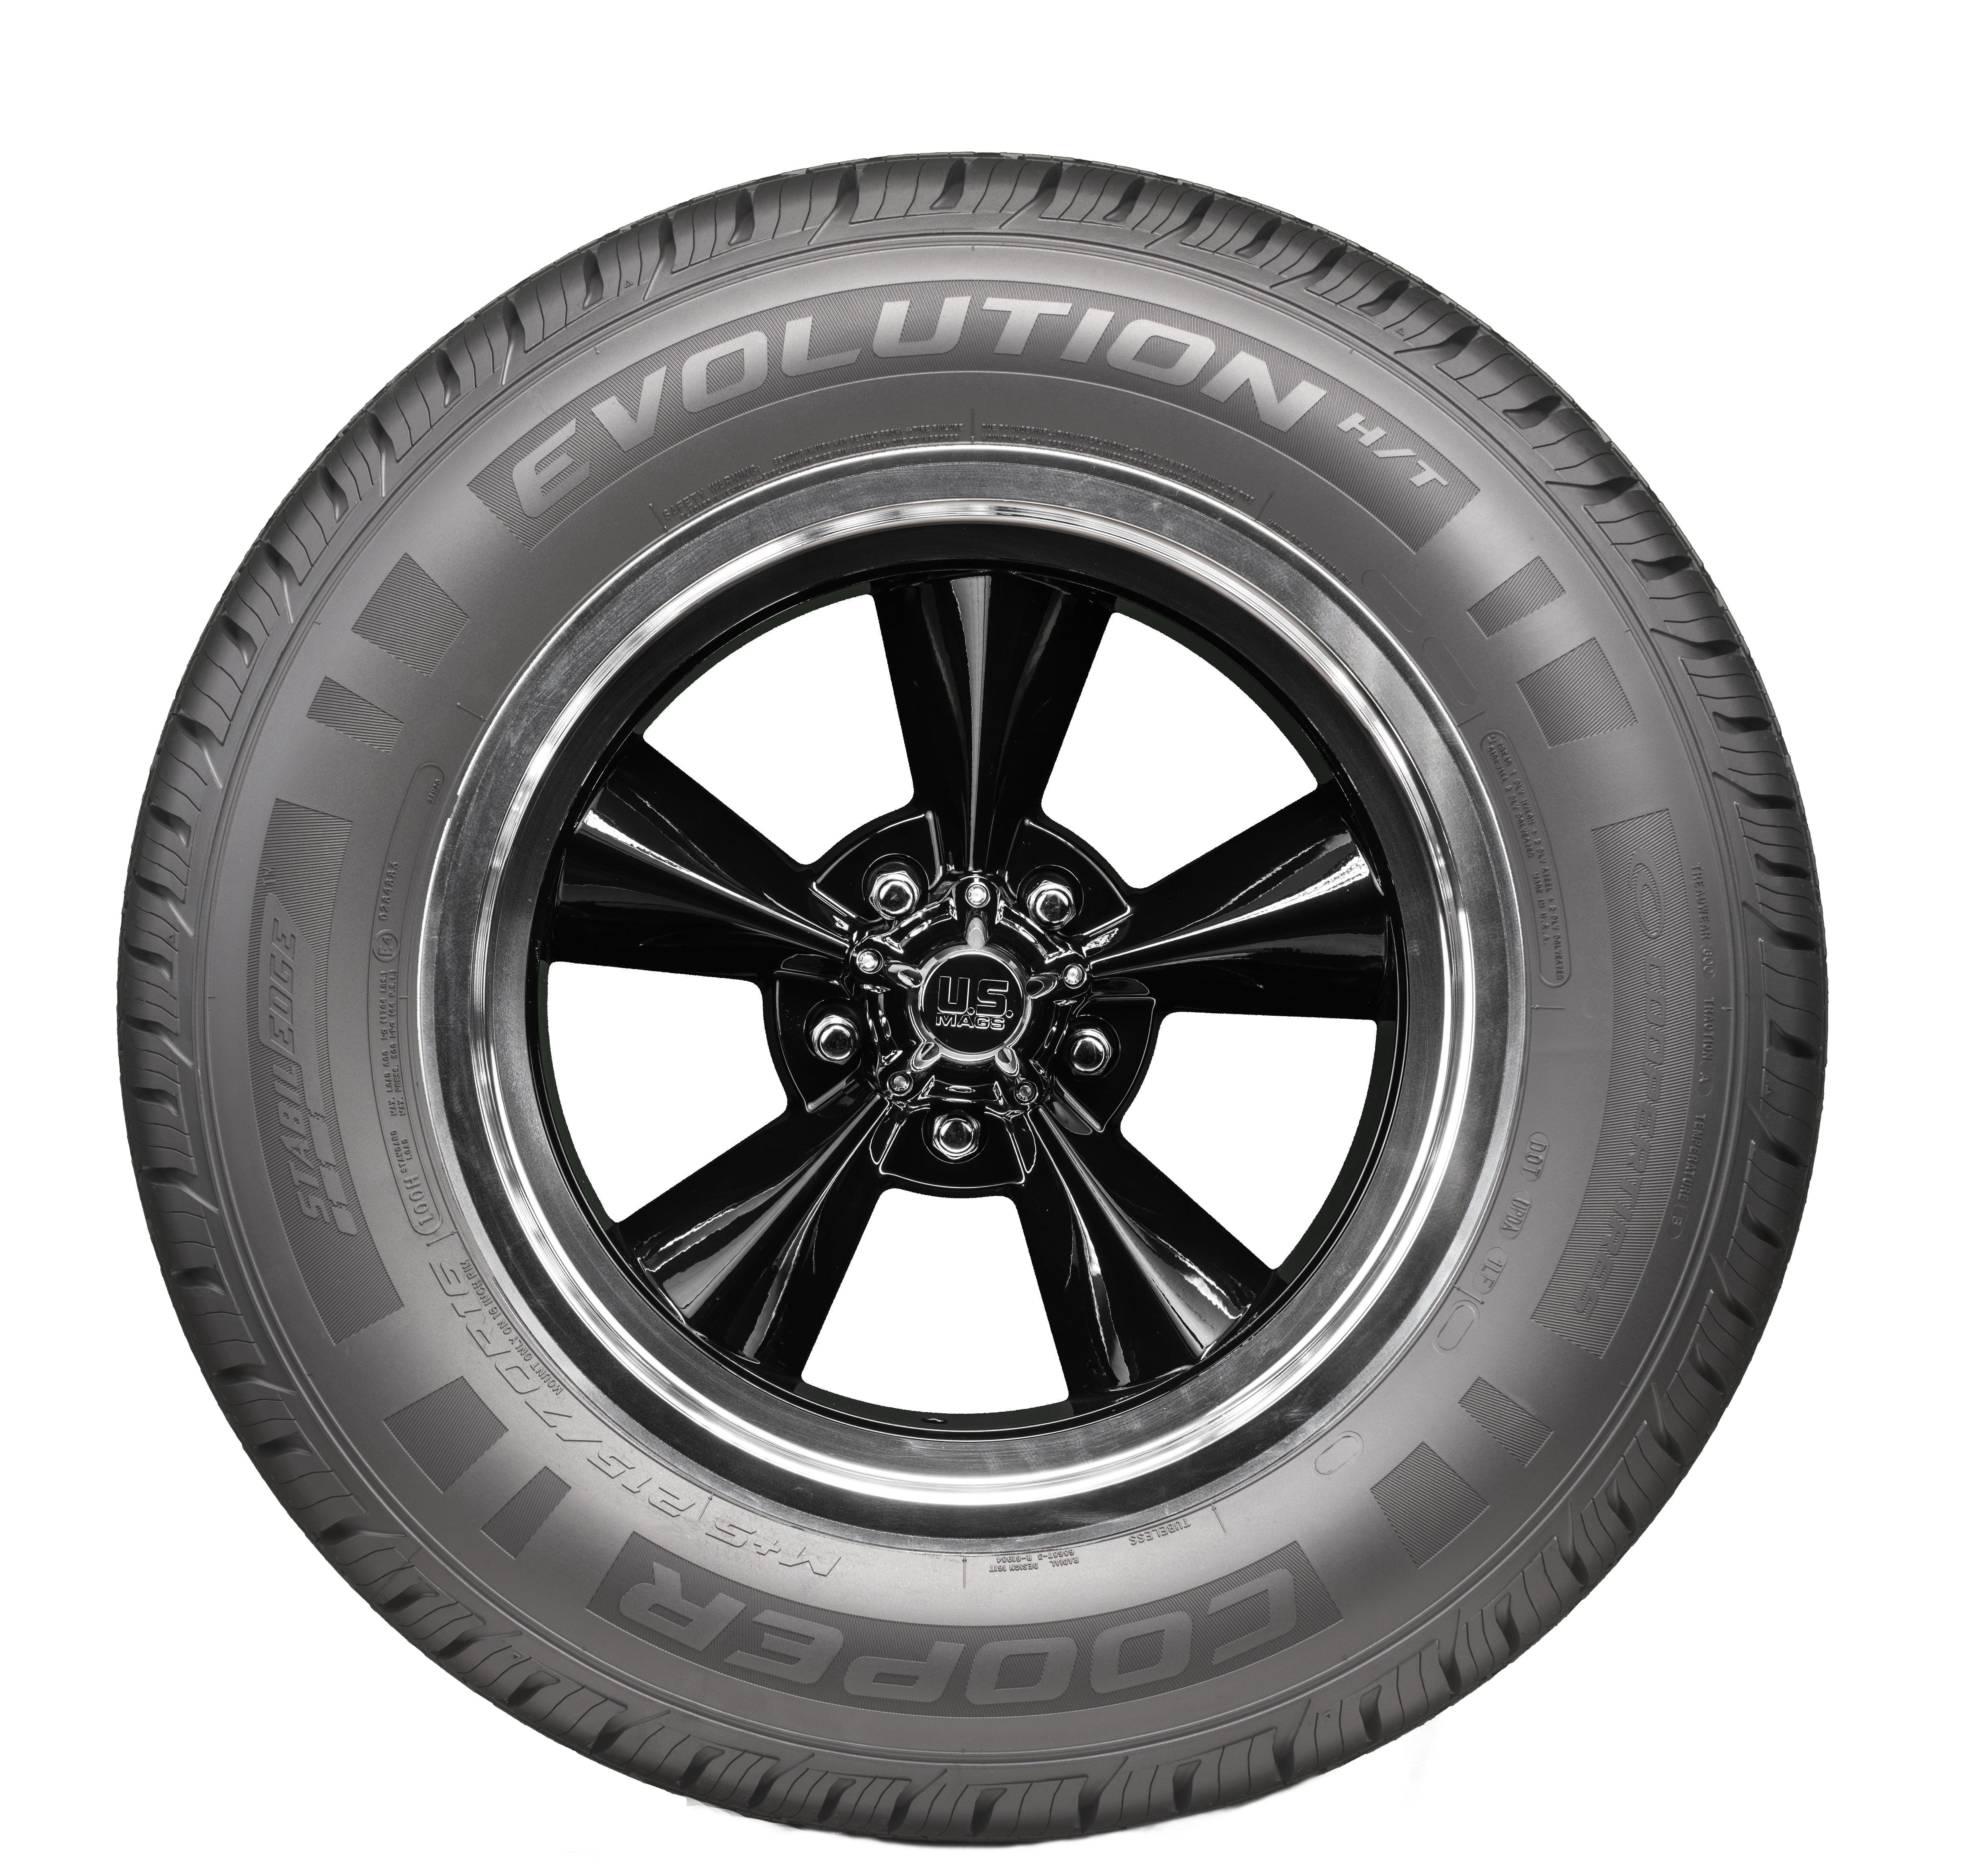 Cooper Evolution H T 255 65r18 111t Tire Walmart Com